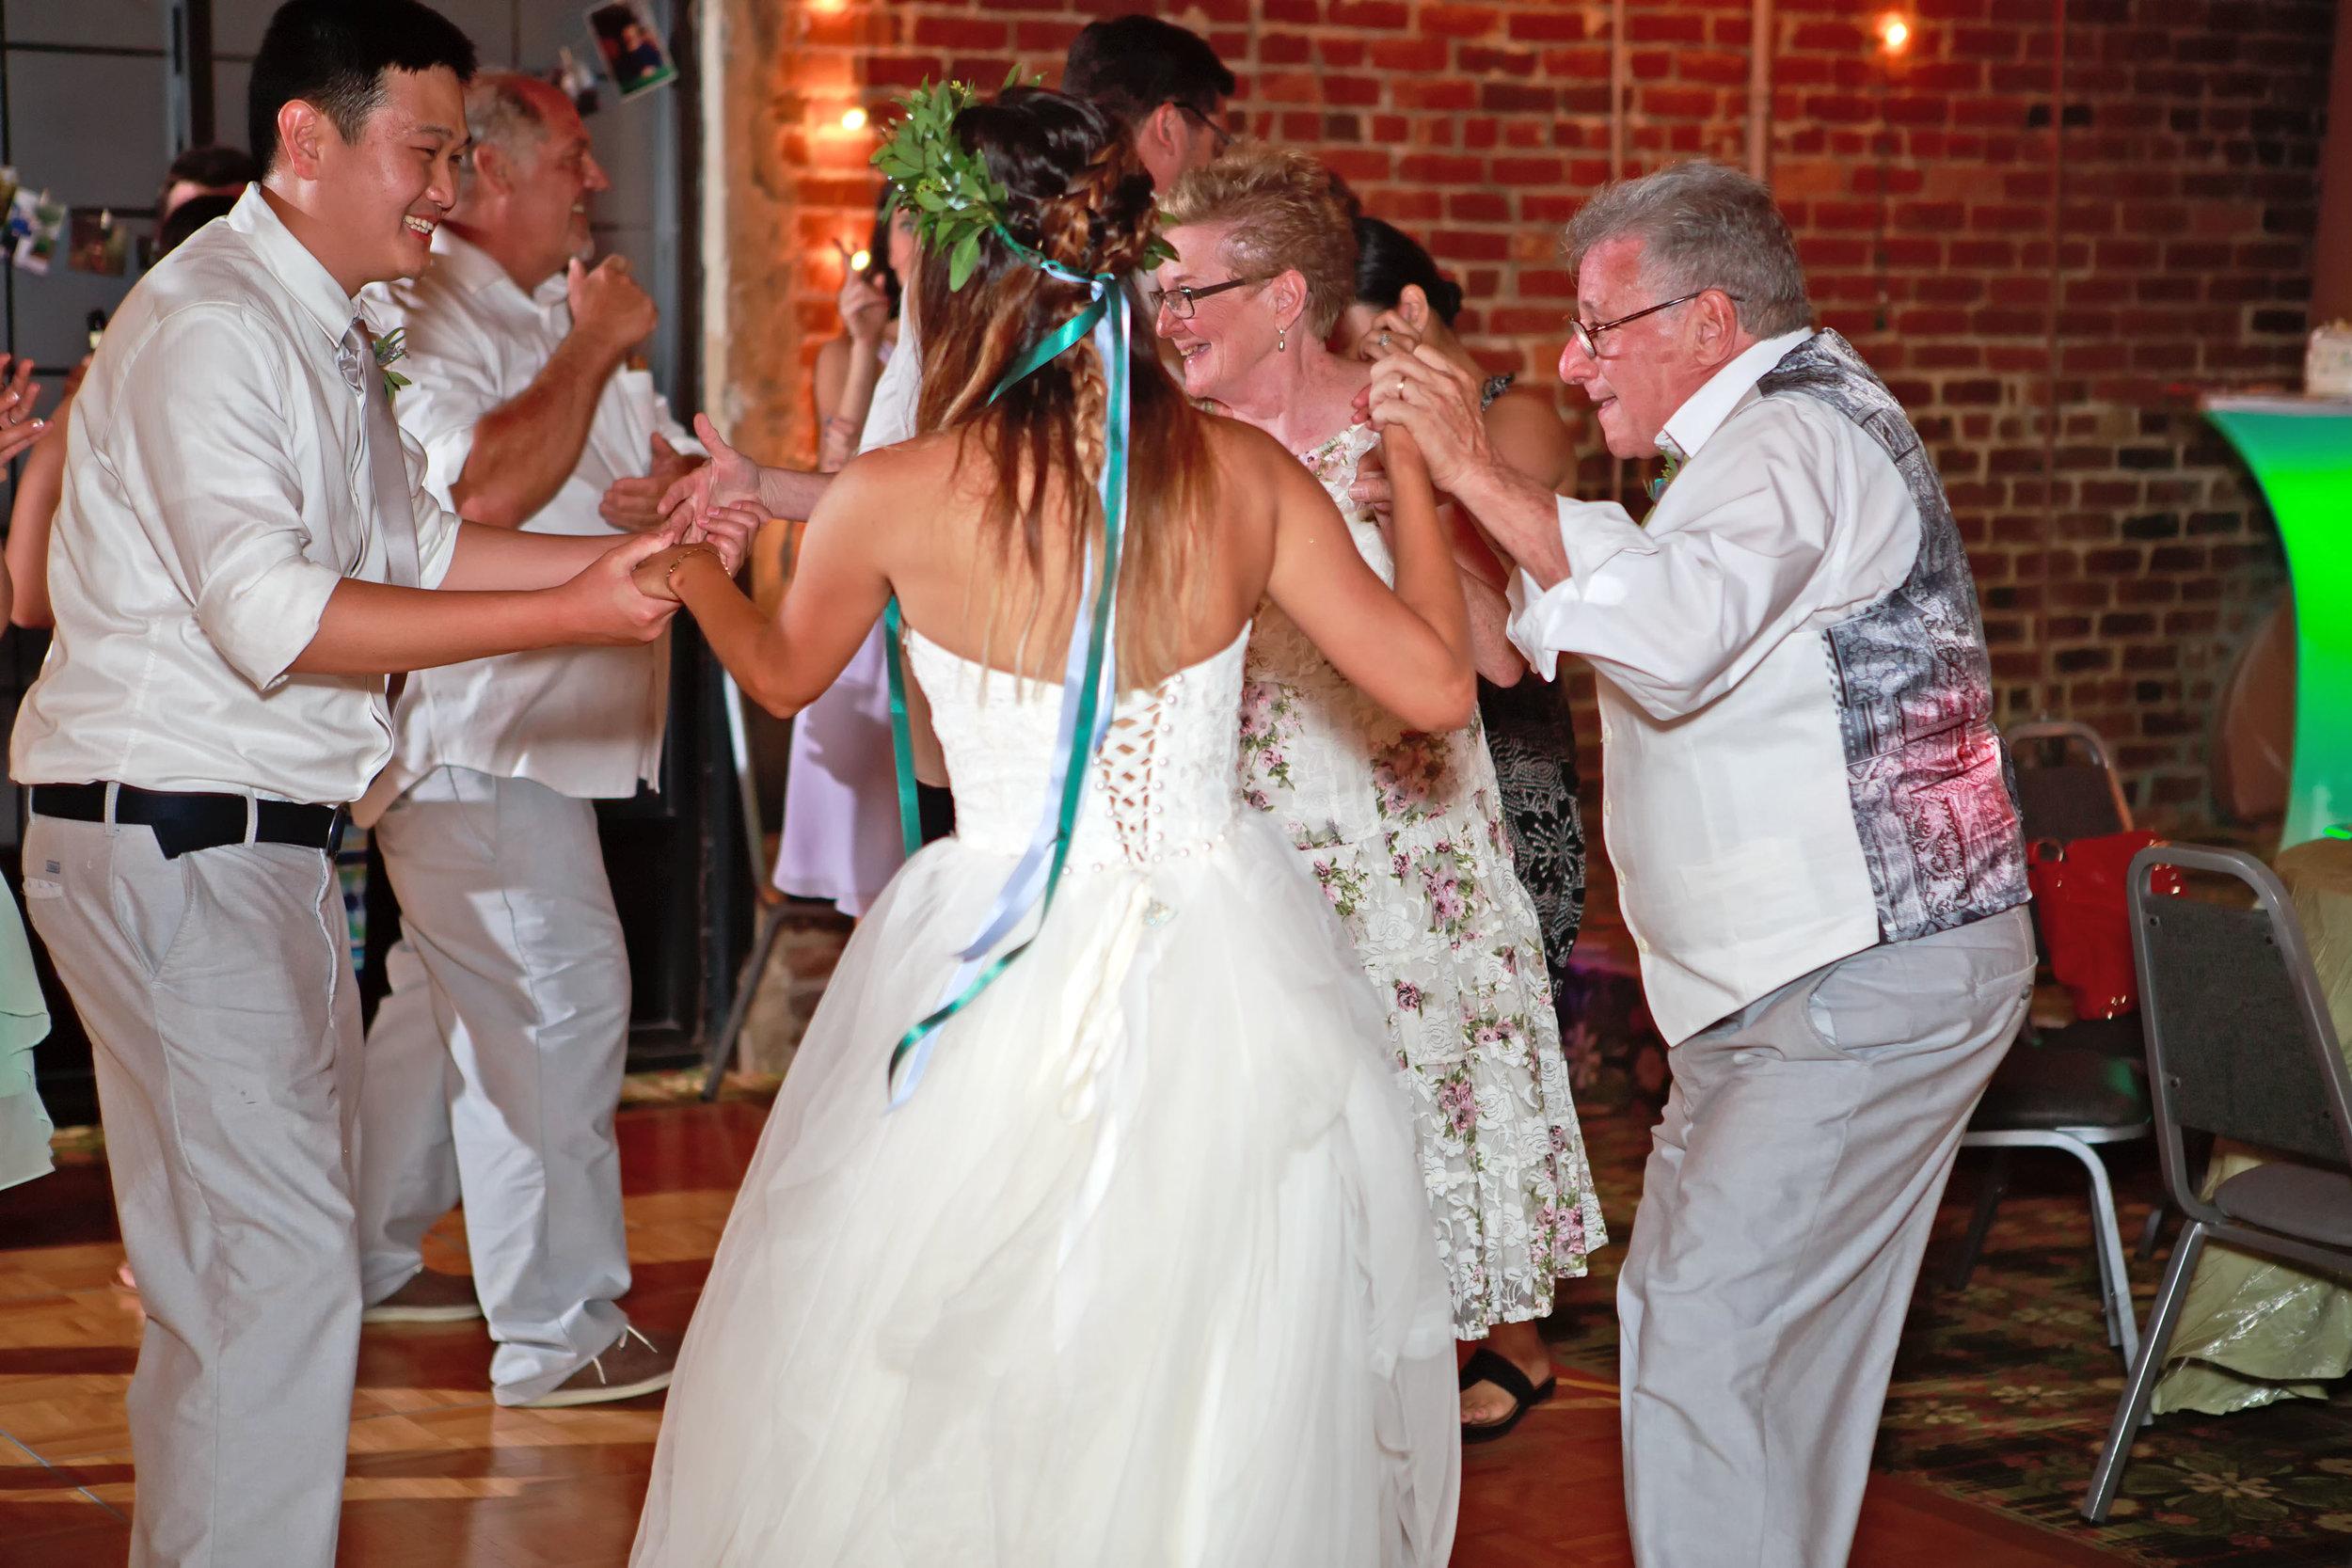 North_Carolina_Wedding_Photographer_Tiffany_Abruzzo_Reception_126.jpg